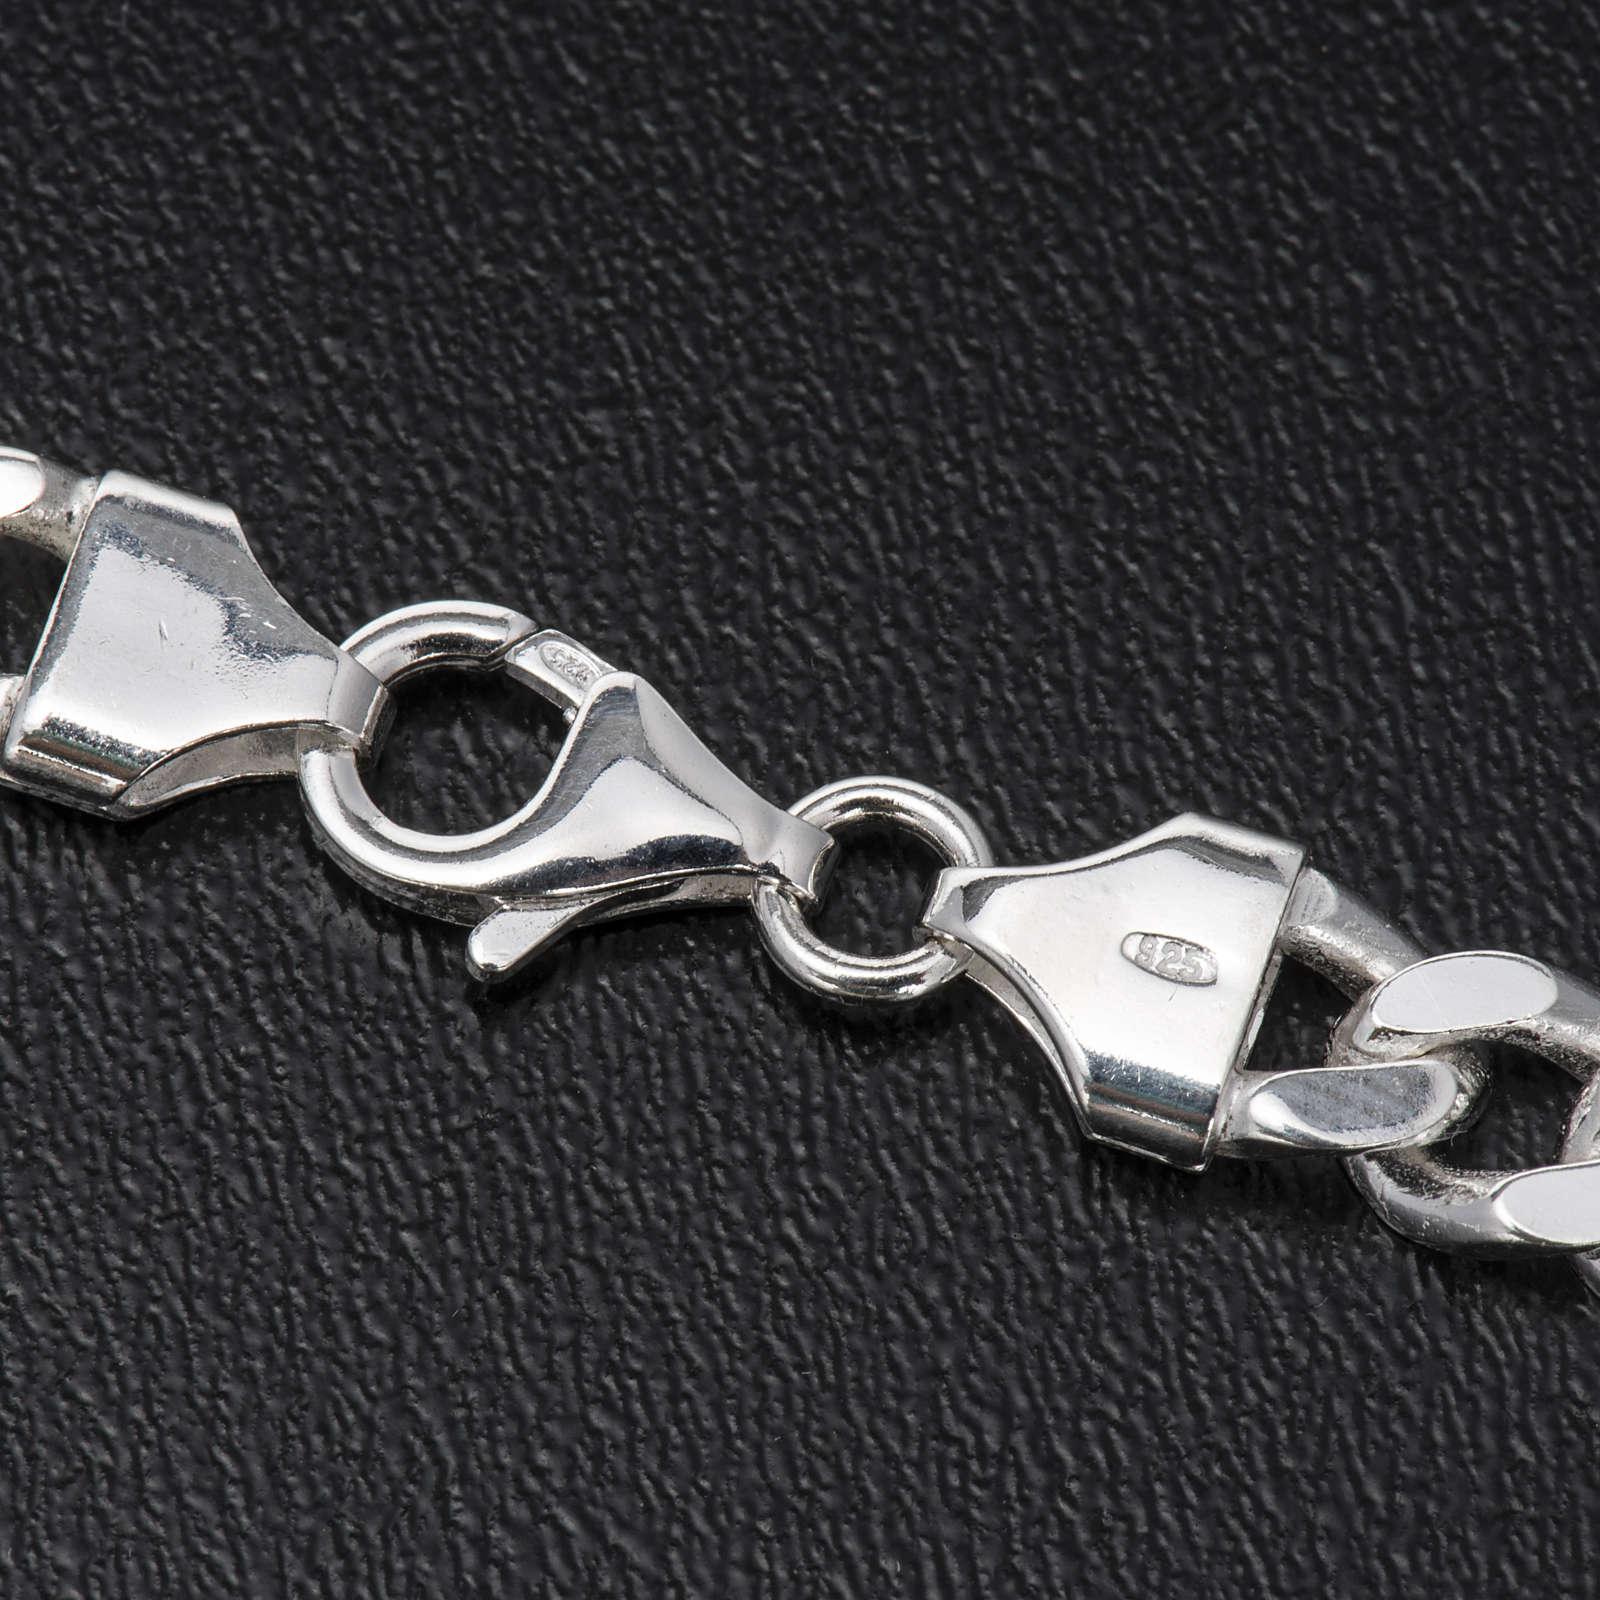 Corrente bispo prata 925 groumett batido 2 lados 90 cm 3